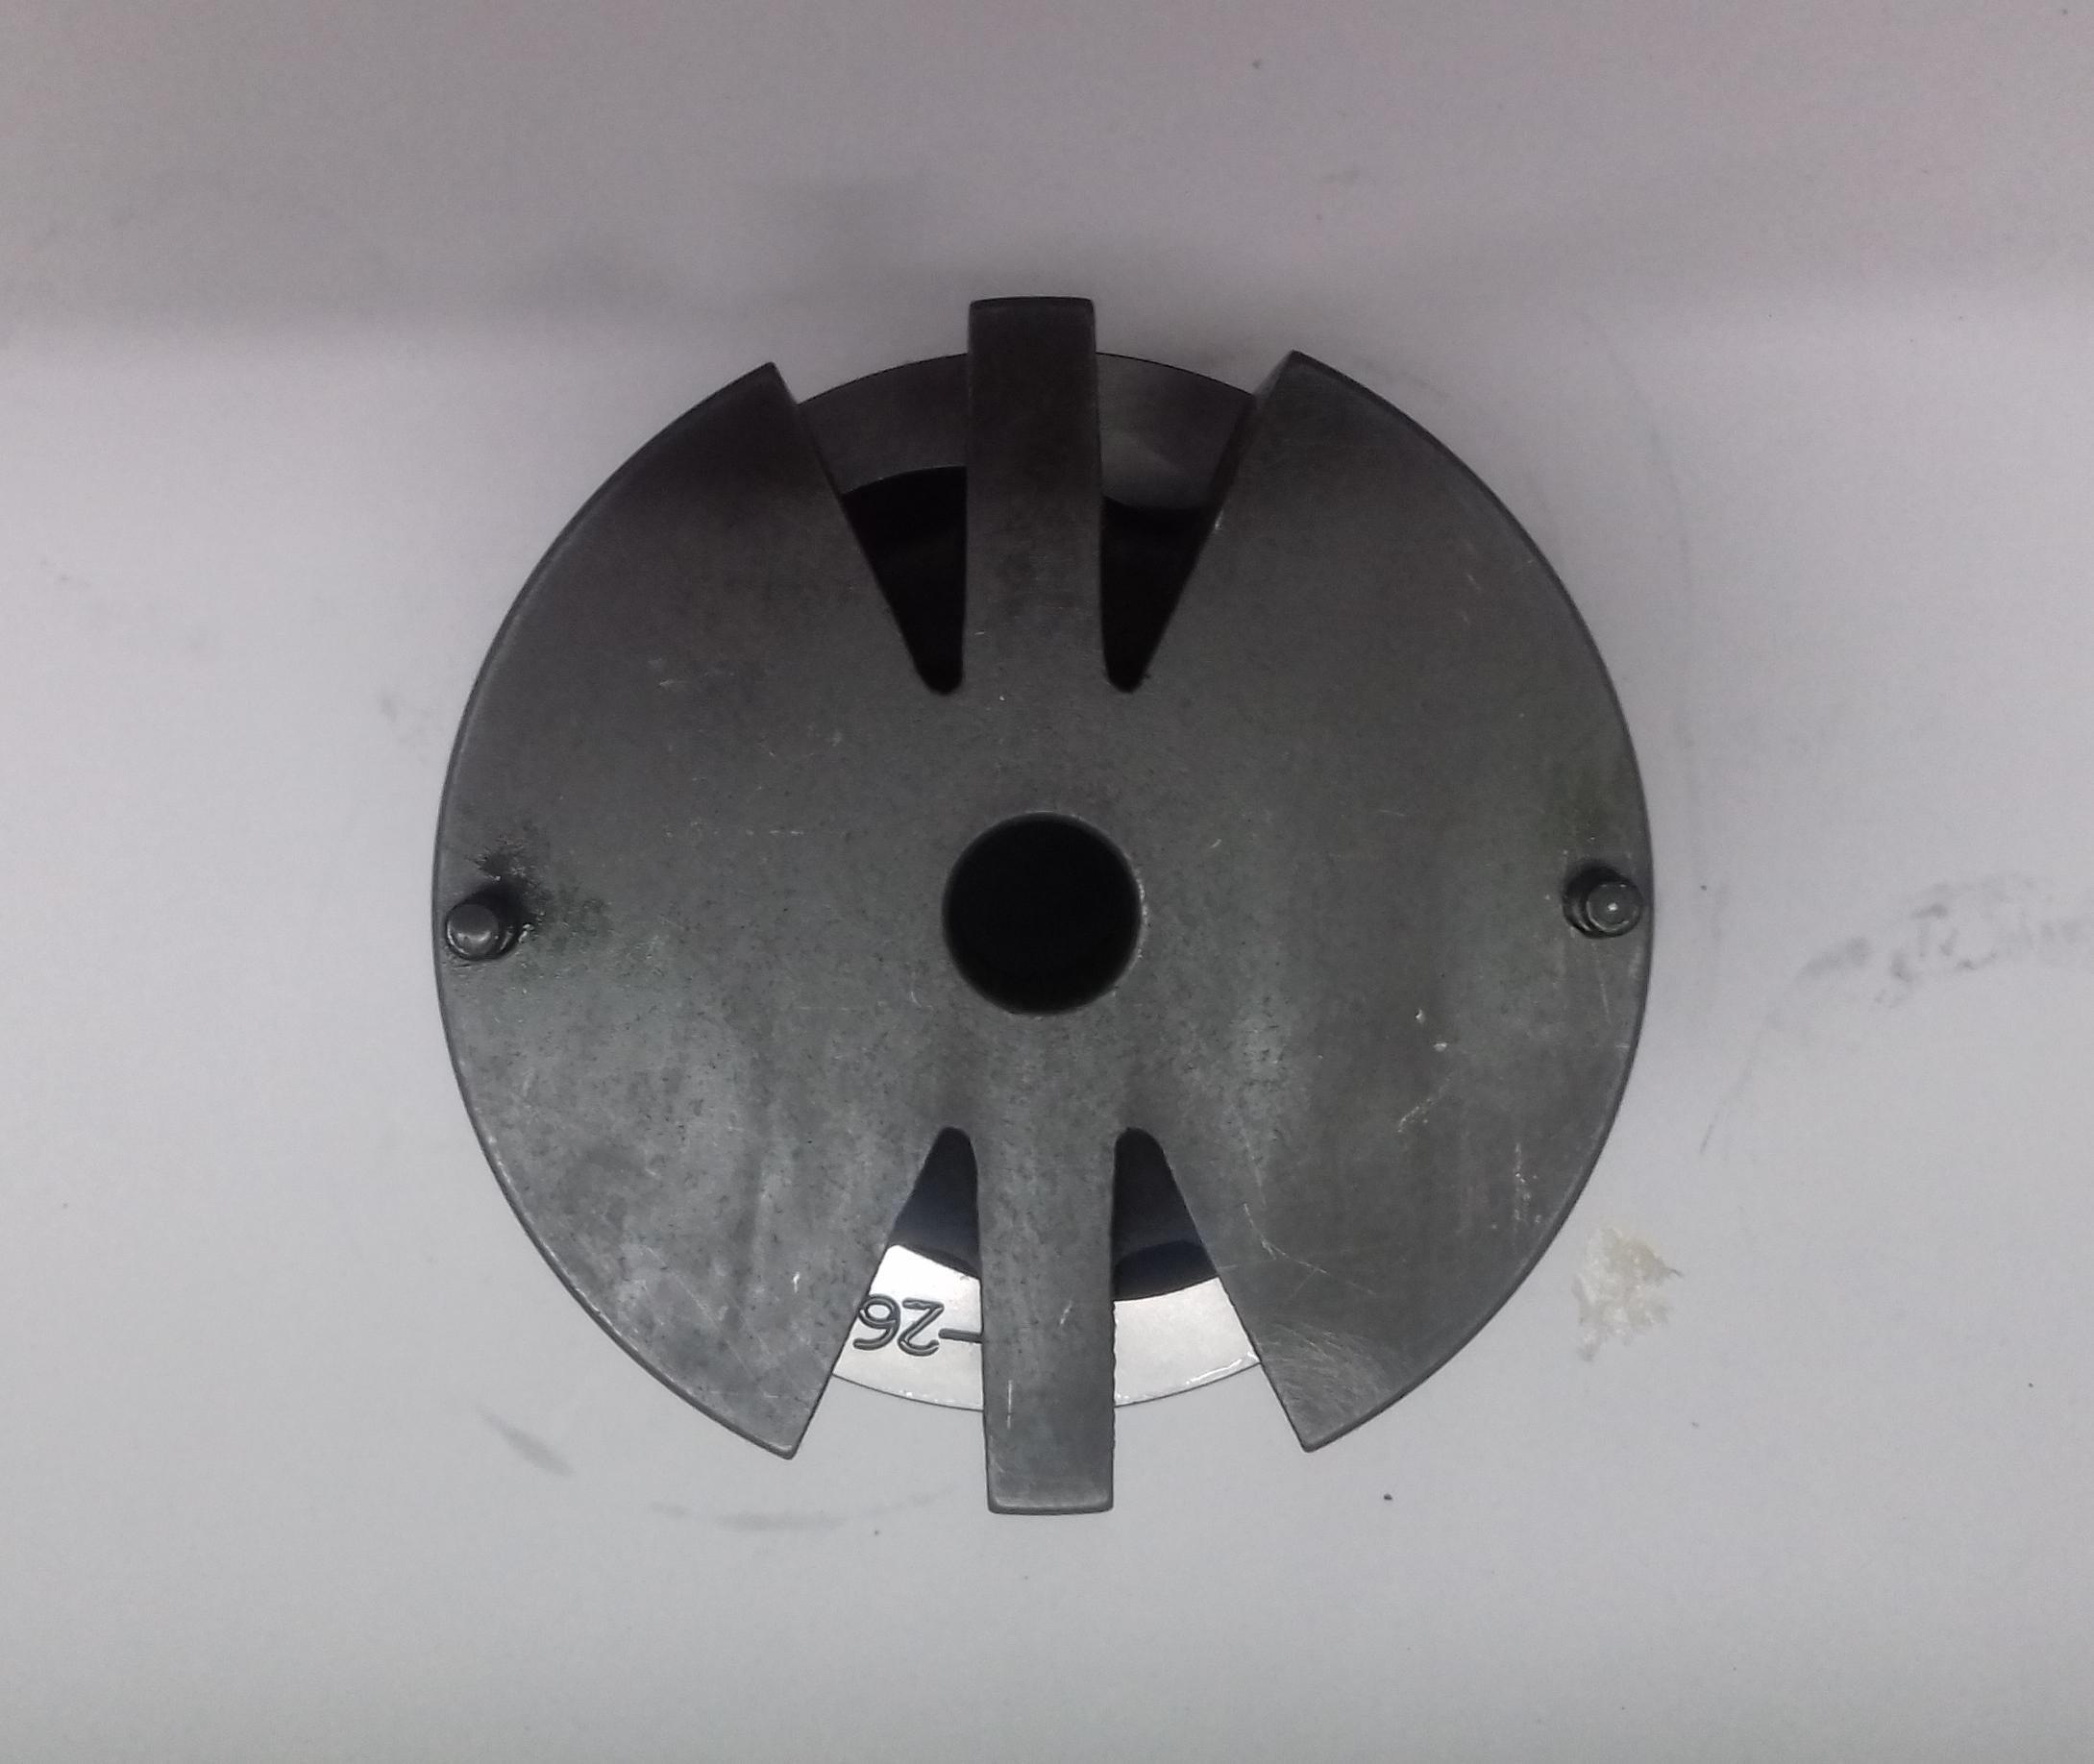 Yuken Hydraulic Vane Pump Spares Catridige Kit CPVR50-26-R-31